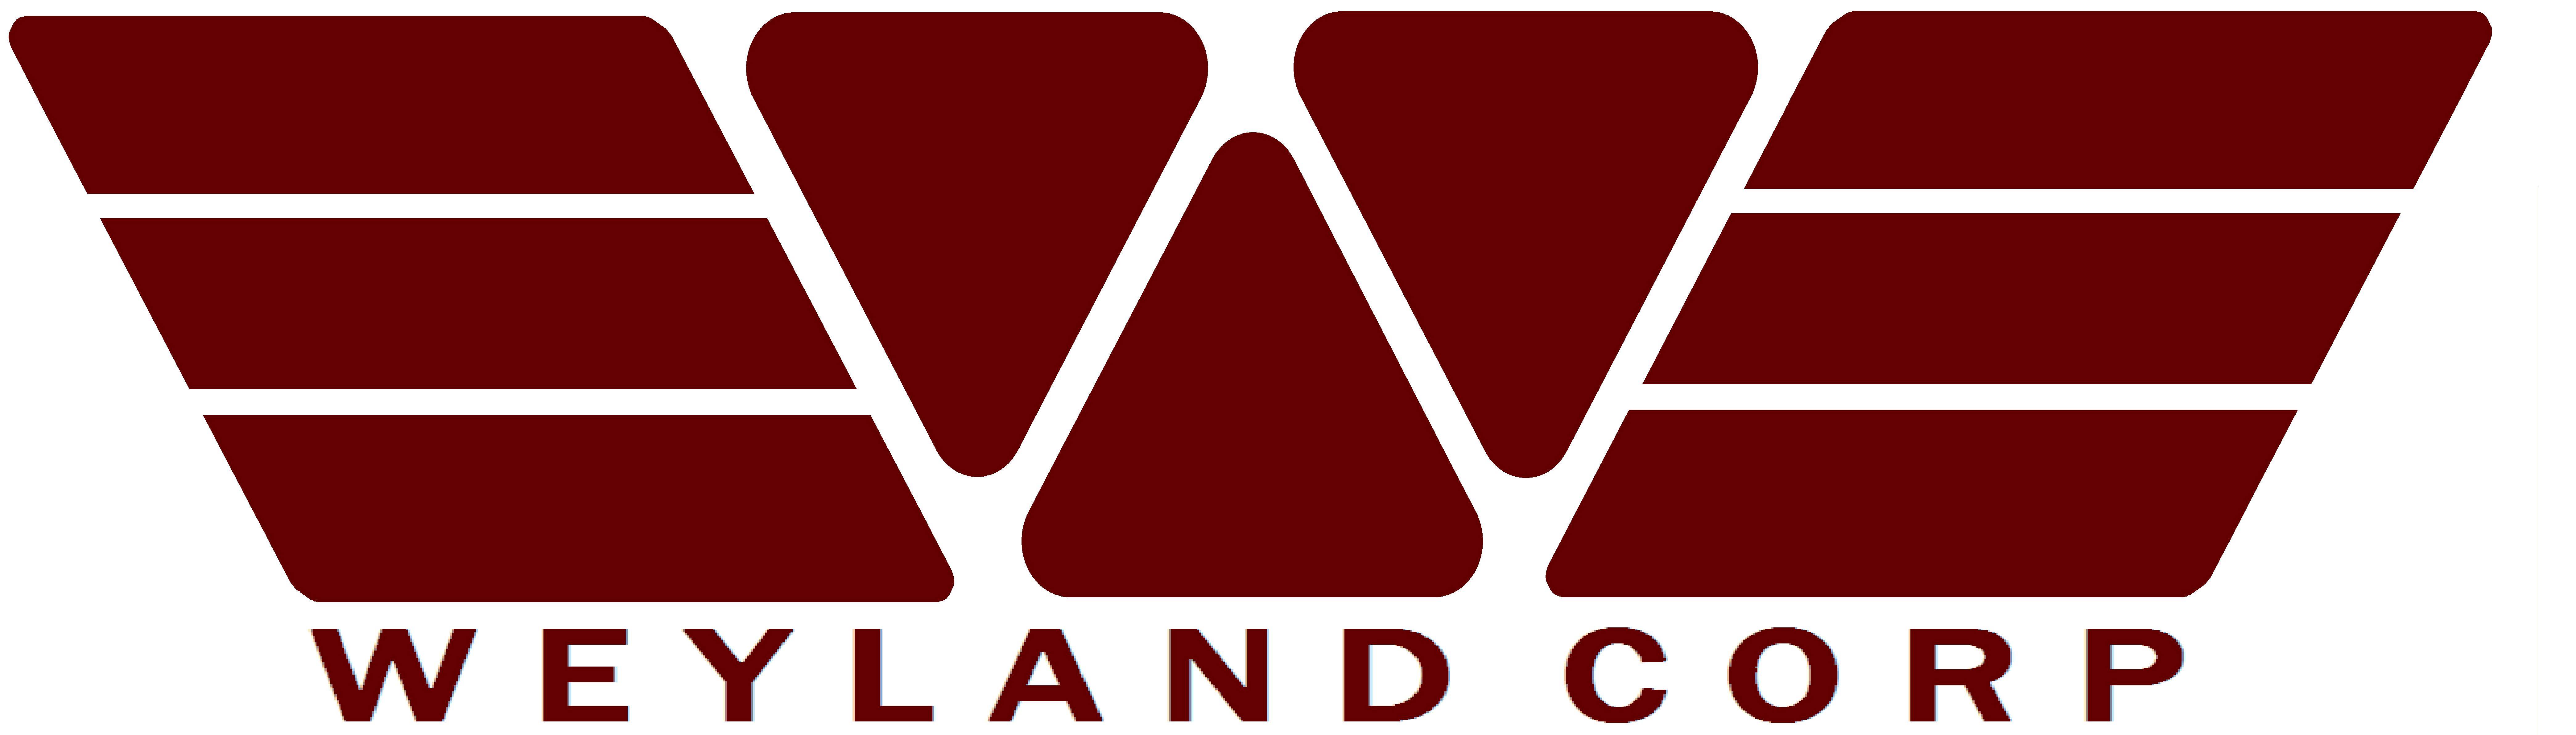 Weyland corp logo by weylandyutaniassoc d4nmu6g